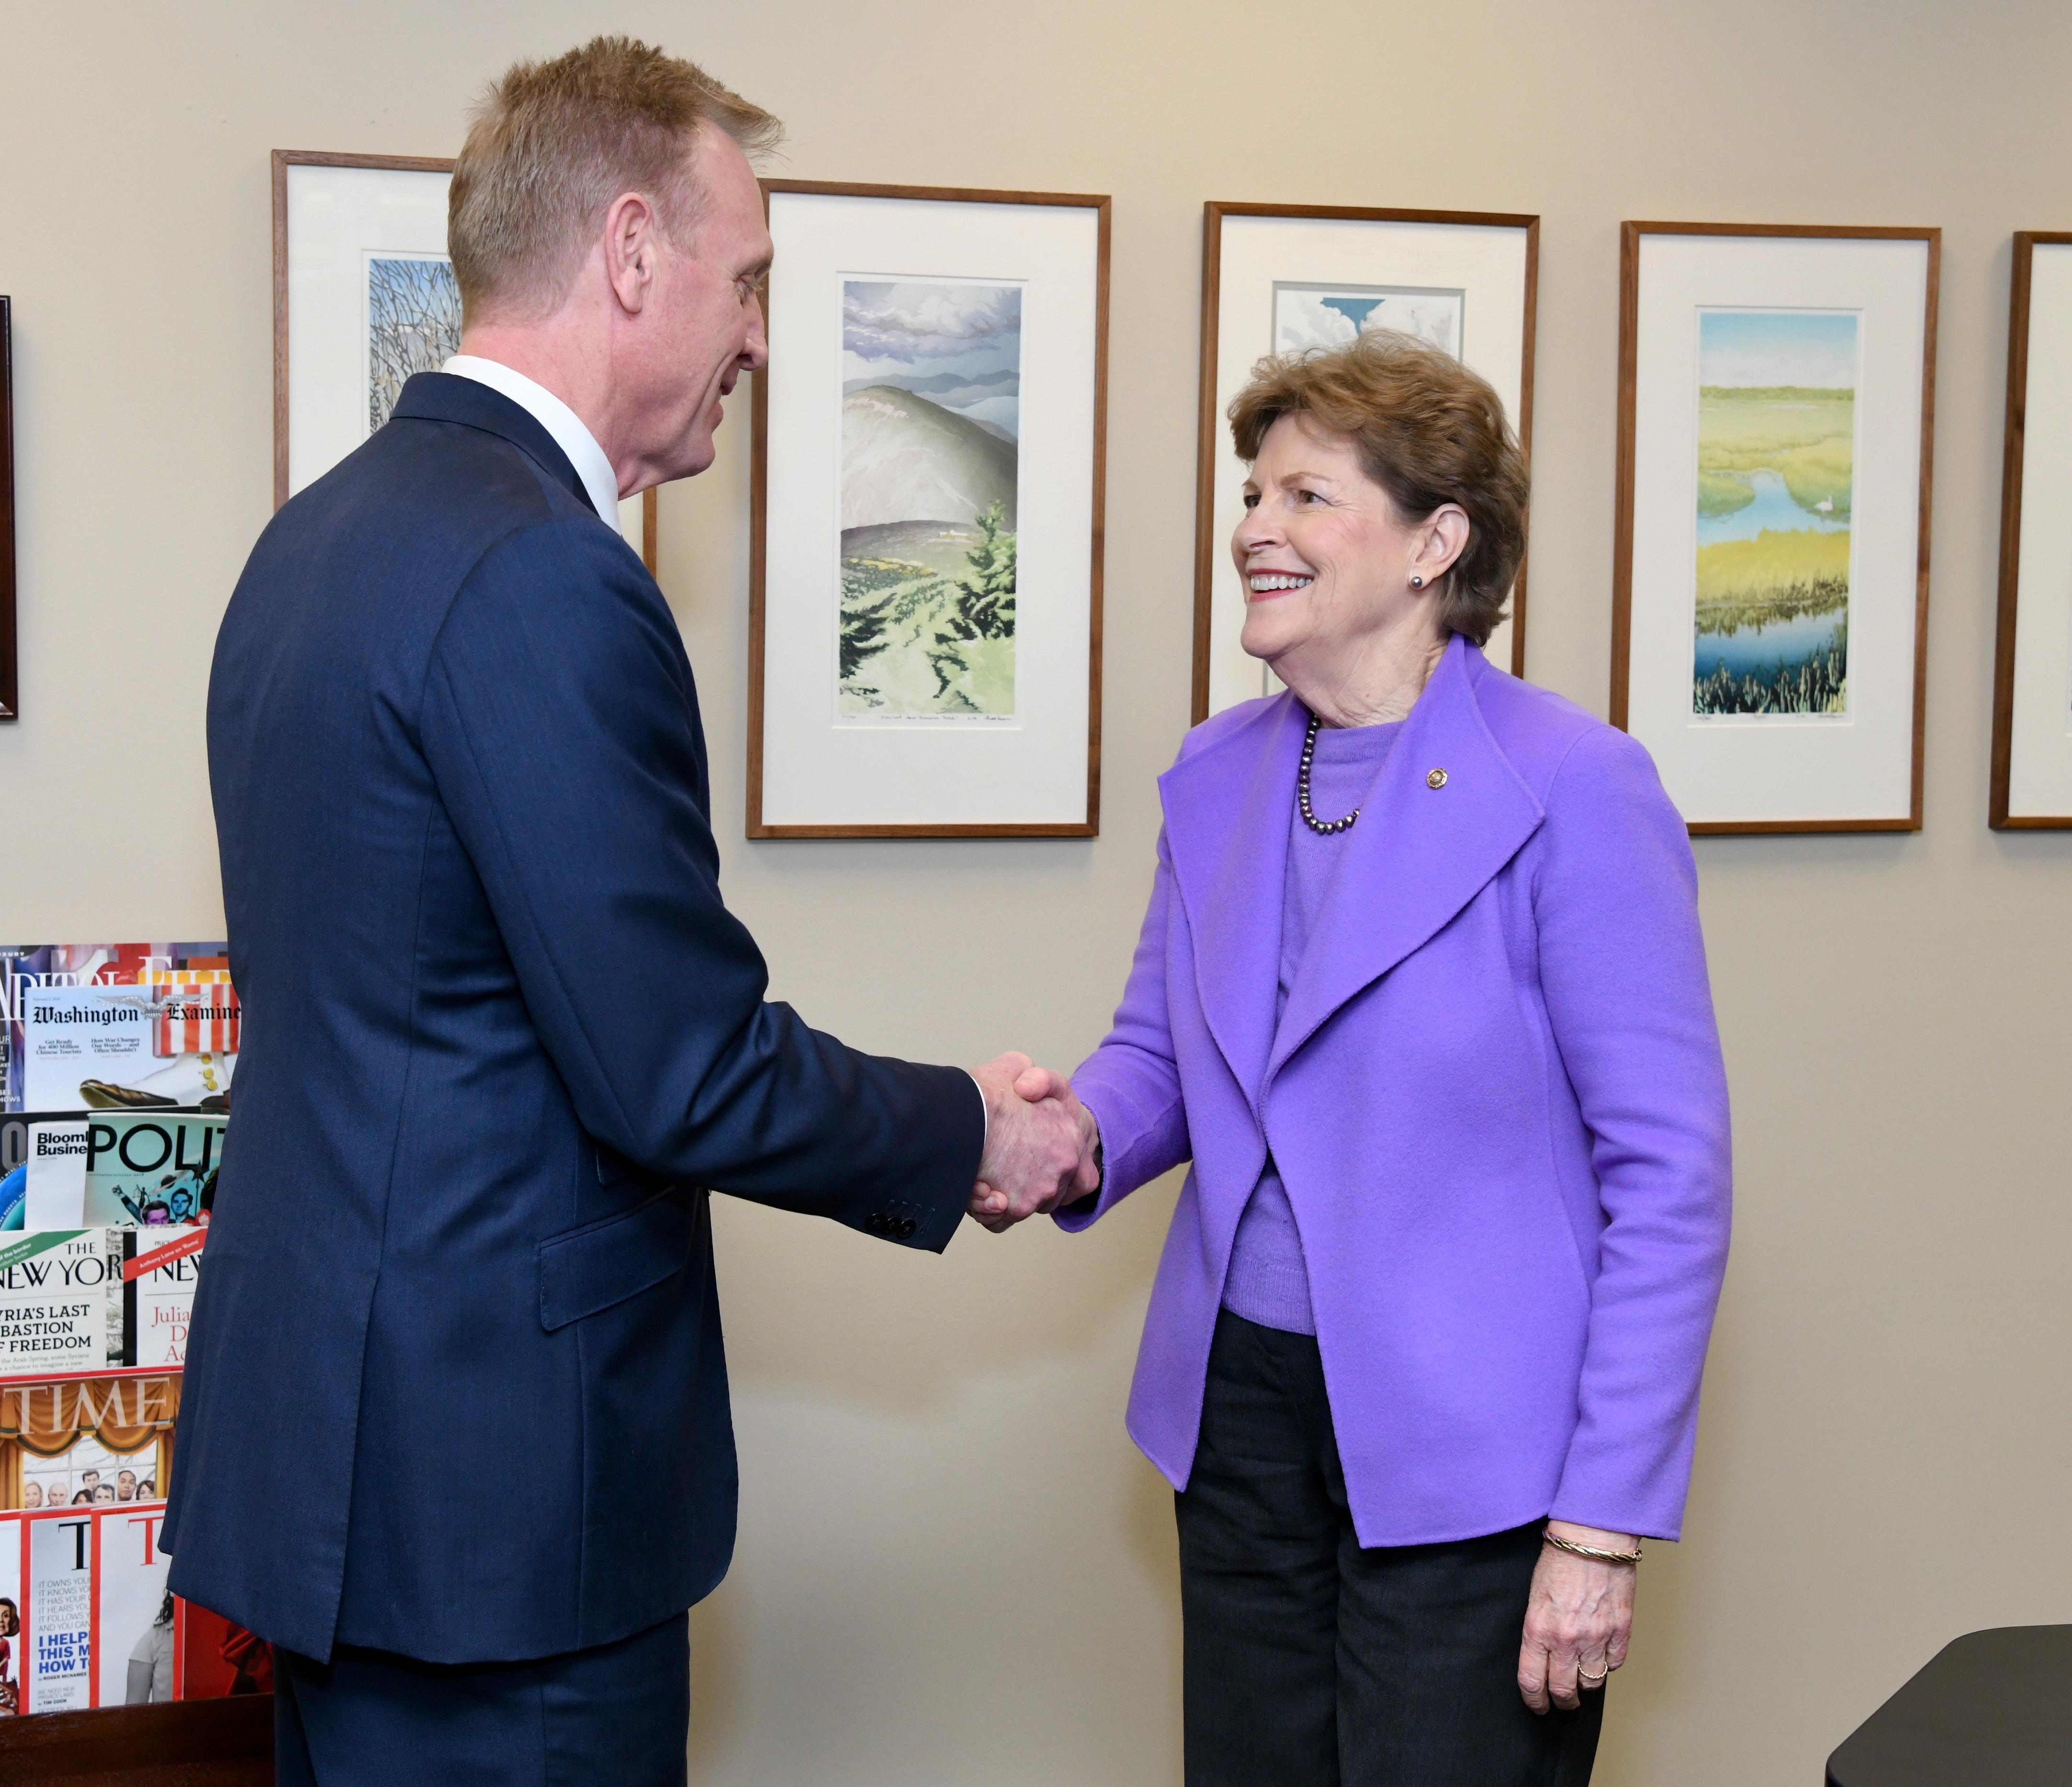 Senator Shaheen and Secretary Shanahan